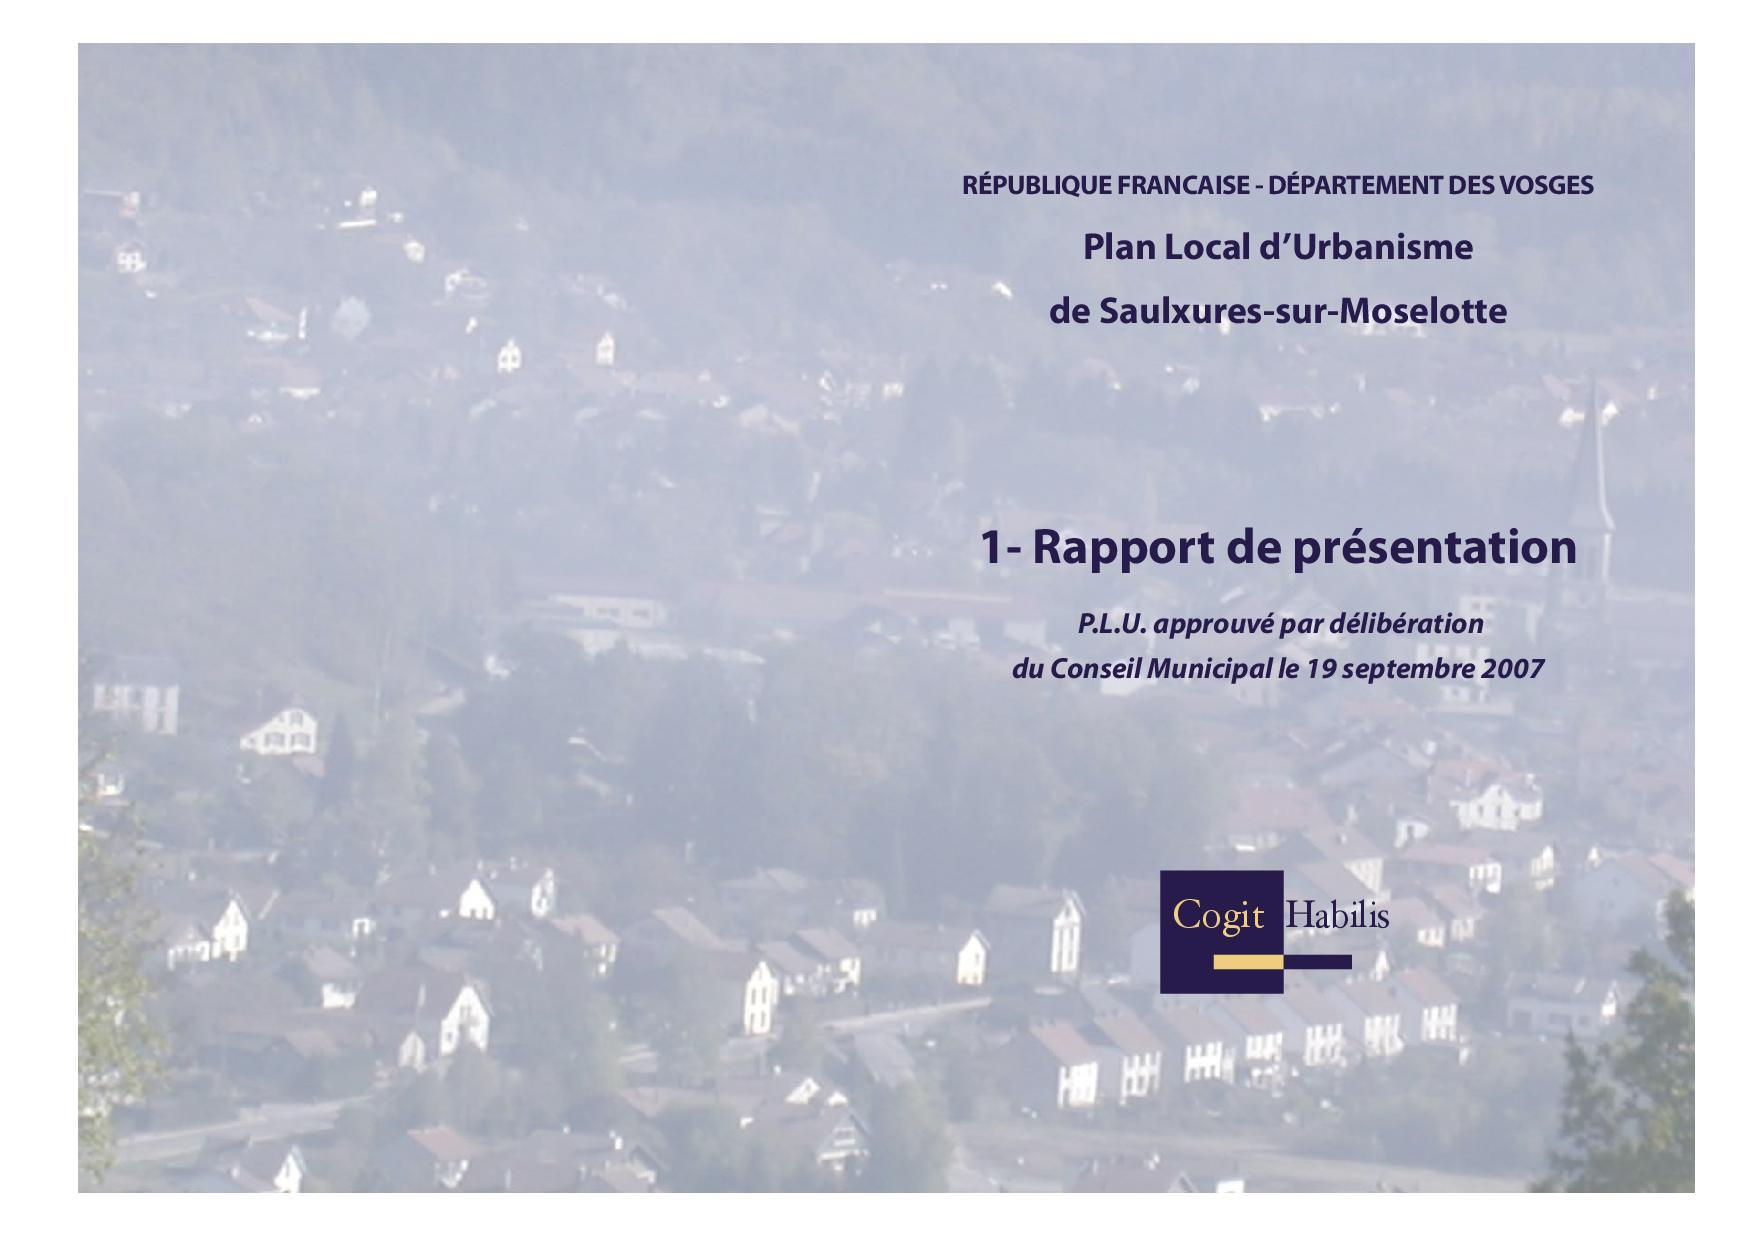 RAPPORT DE PRESENTATIONPLU